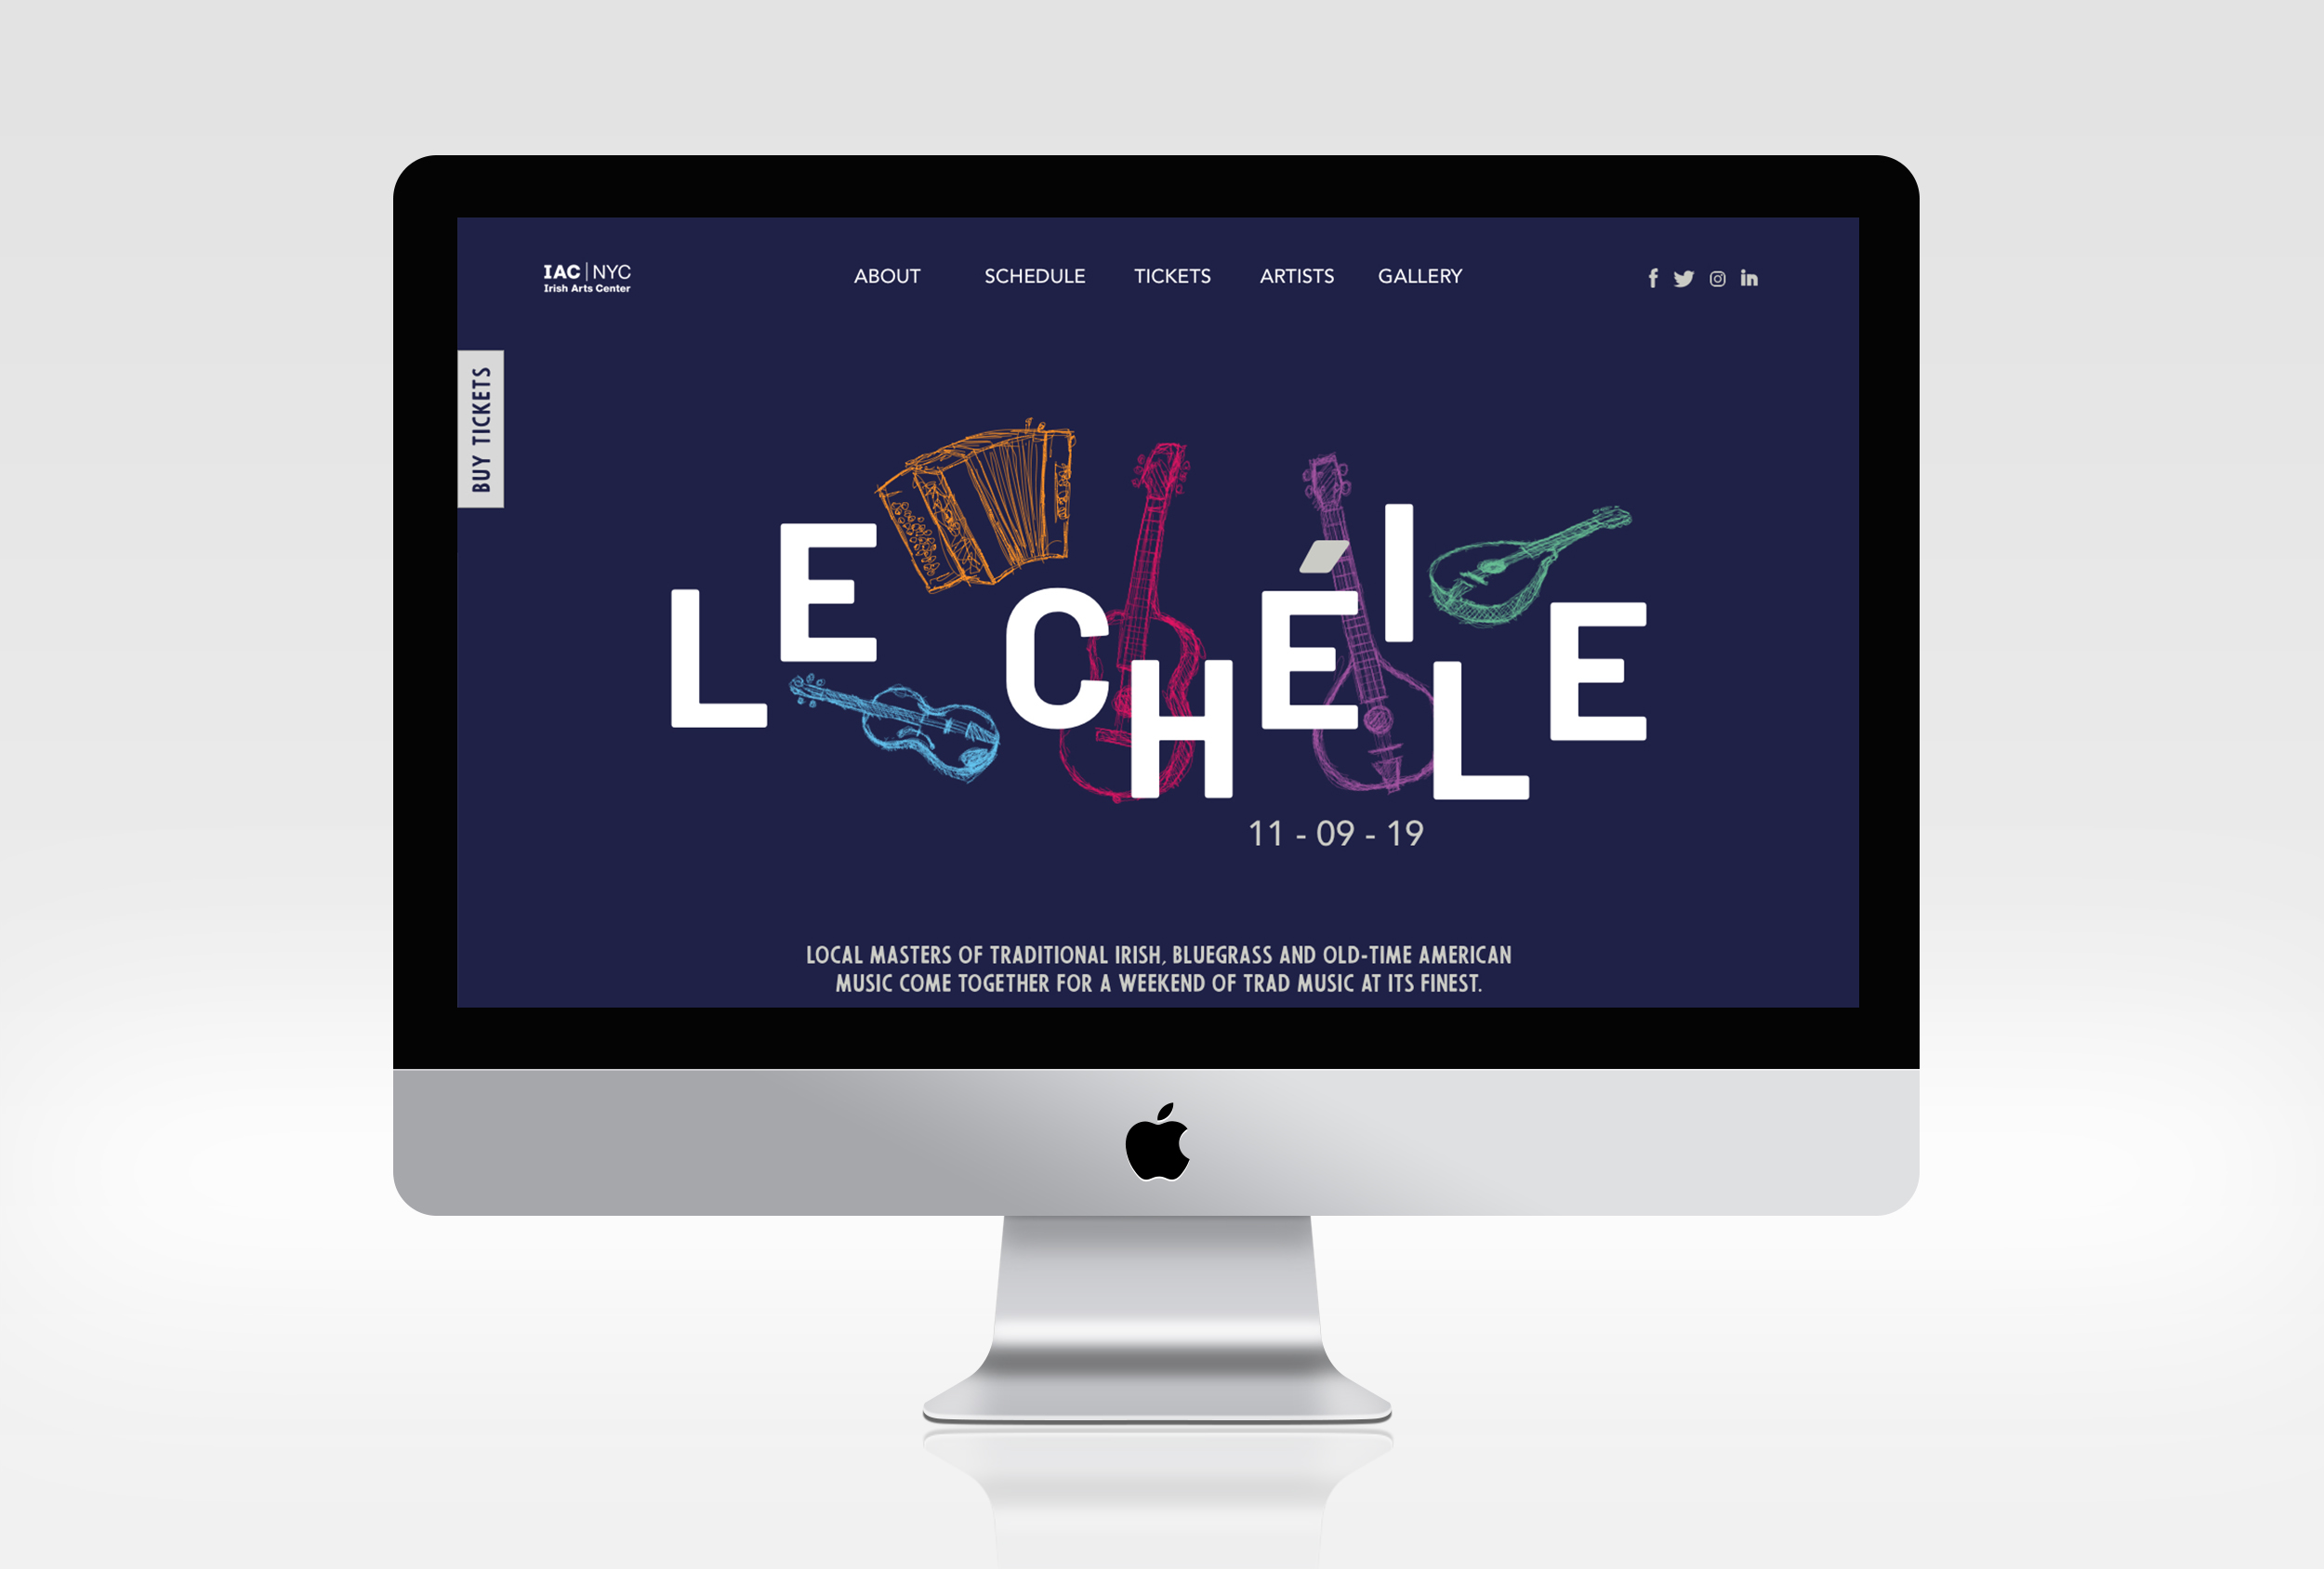 LeCheile_iMac_Mockup.jpg